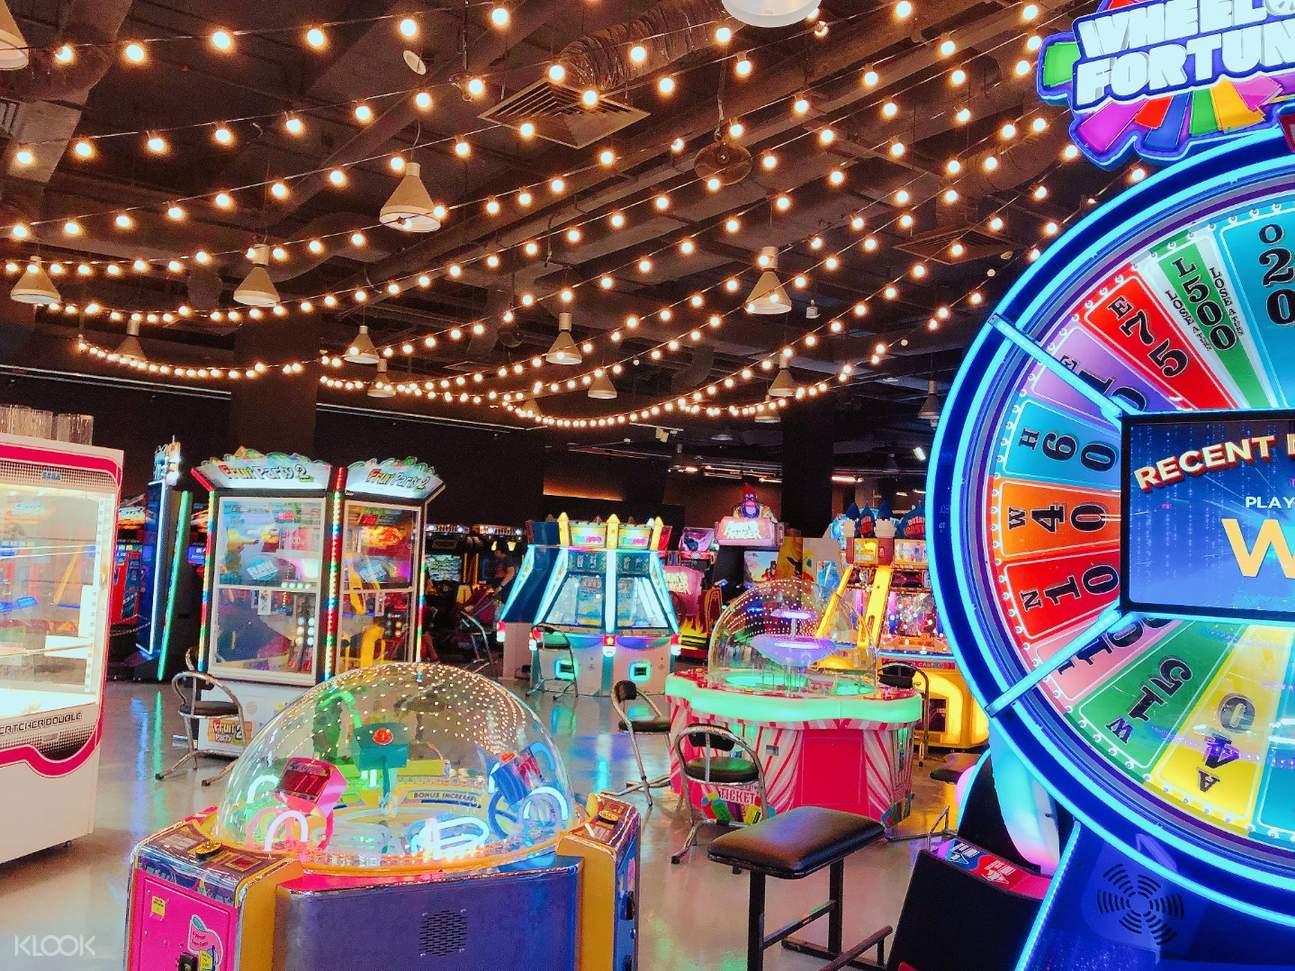 inside fat cat arcade